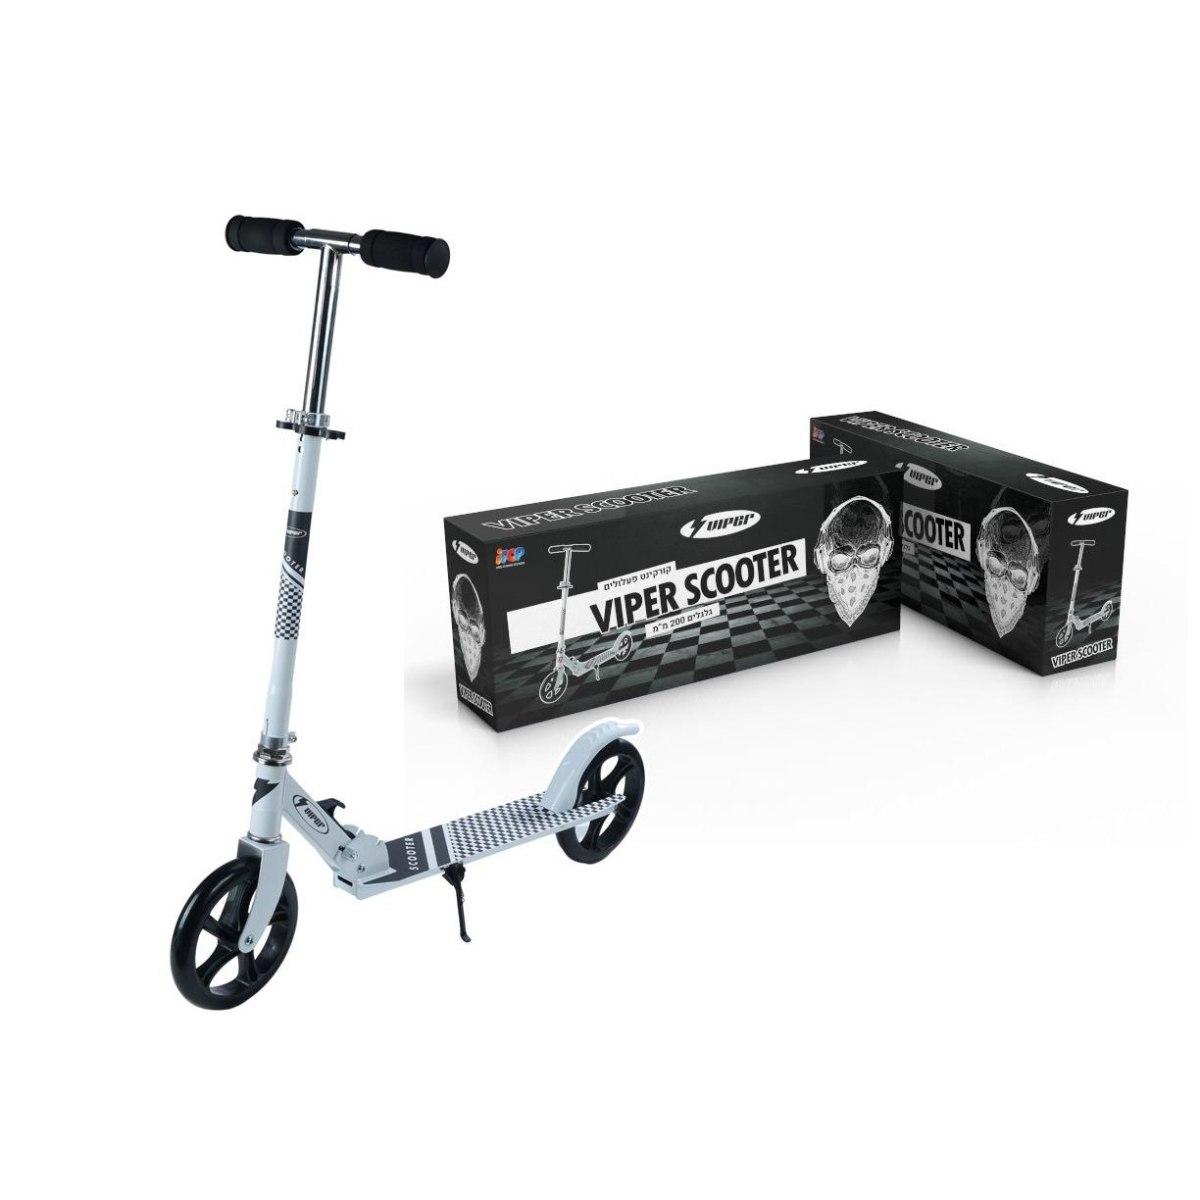 קורקינט מקצועי Viper Scooter